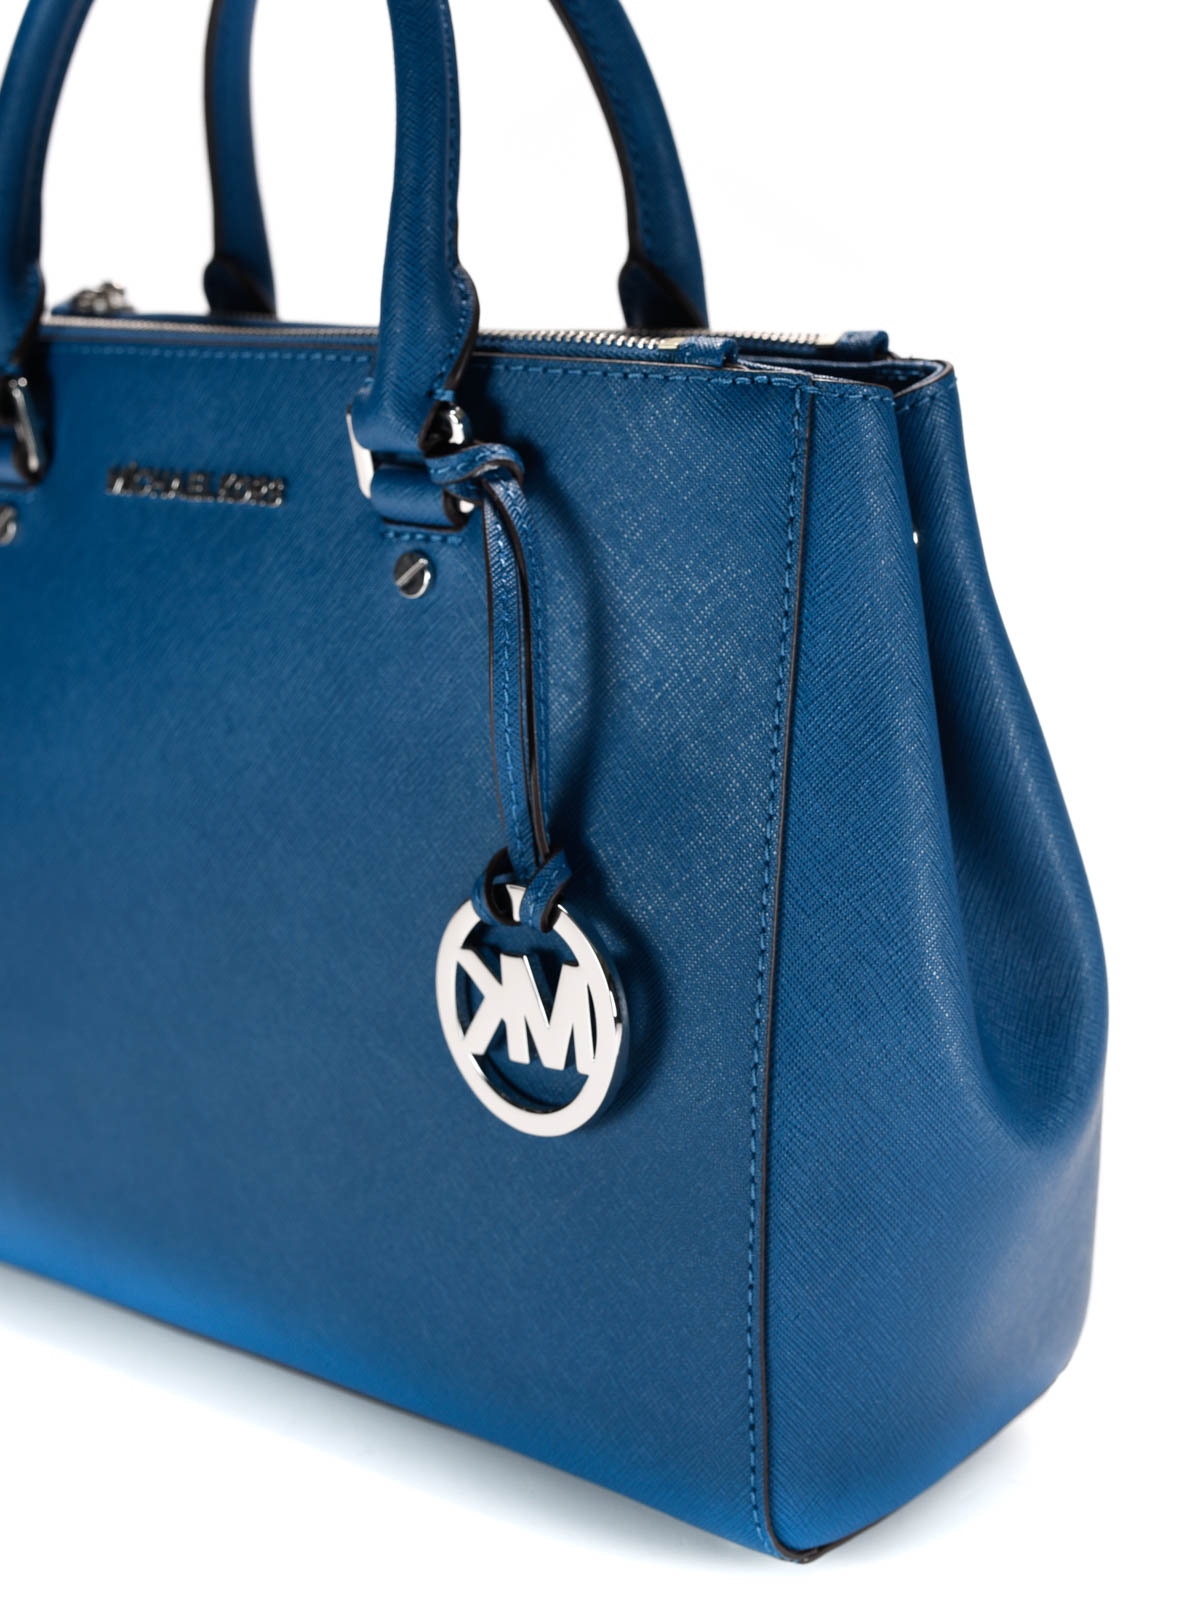 4b254855905c Michael Kors - Sutton Saffiano leather large tote - totes bags - 30S4GTVS6L